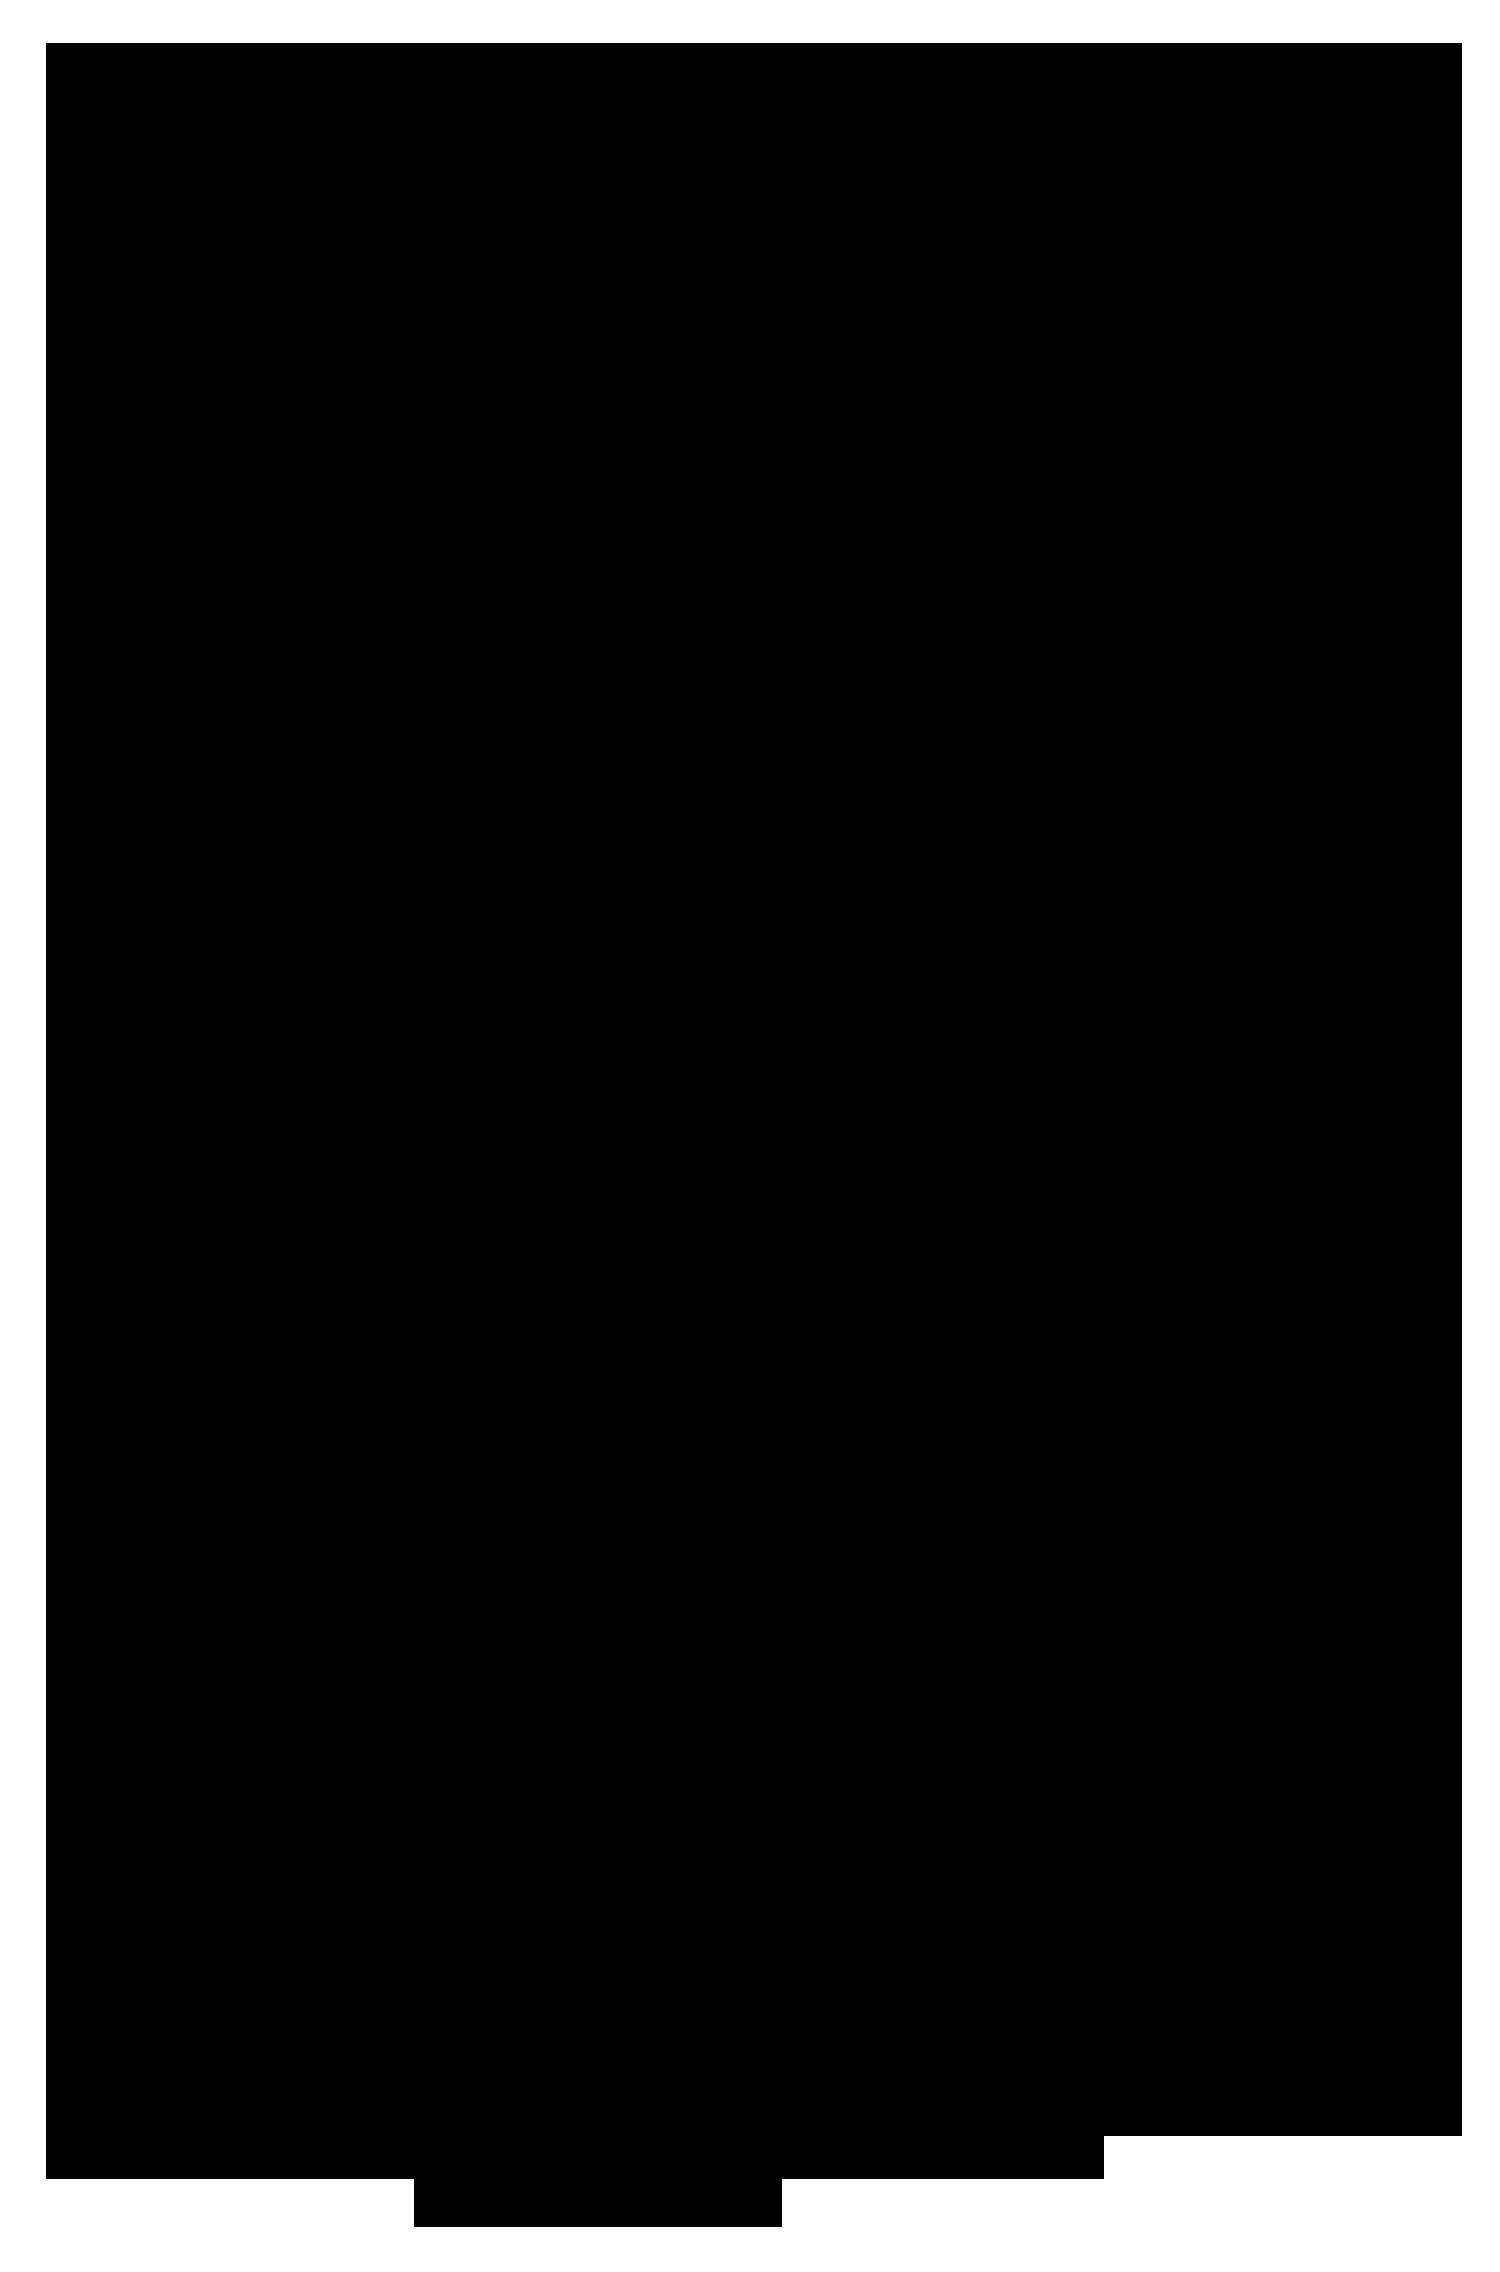 thong-n-dance-logo.png